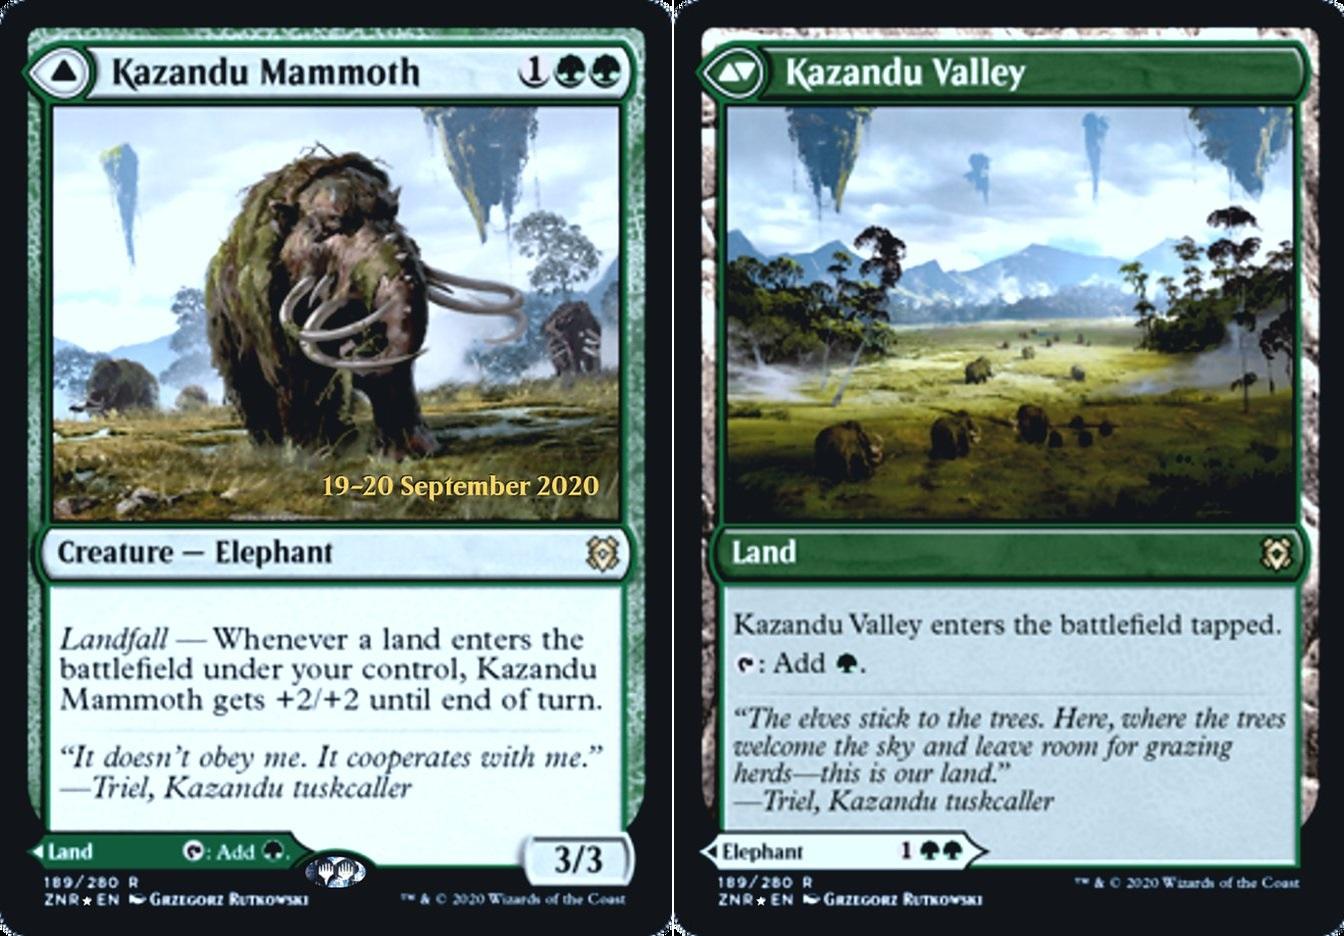 Kazandu Mammoth // Kazandu Valley - Foil - Prerelease Promo